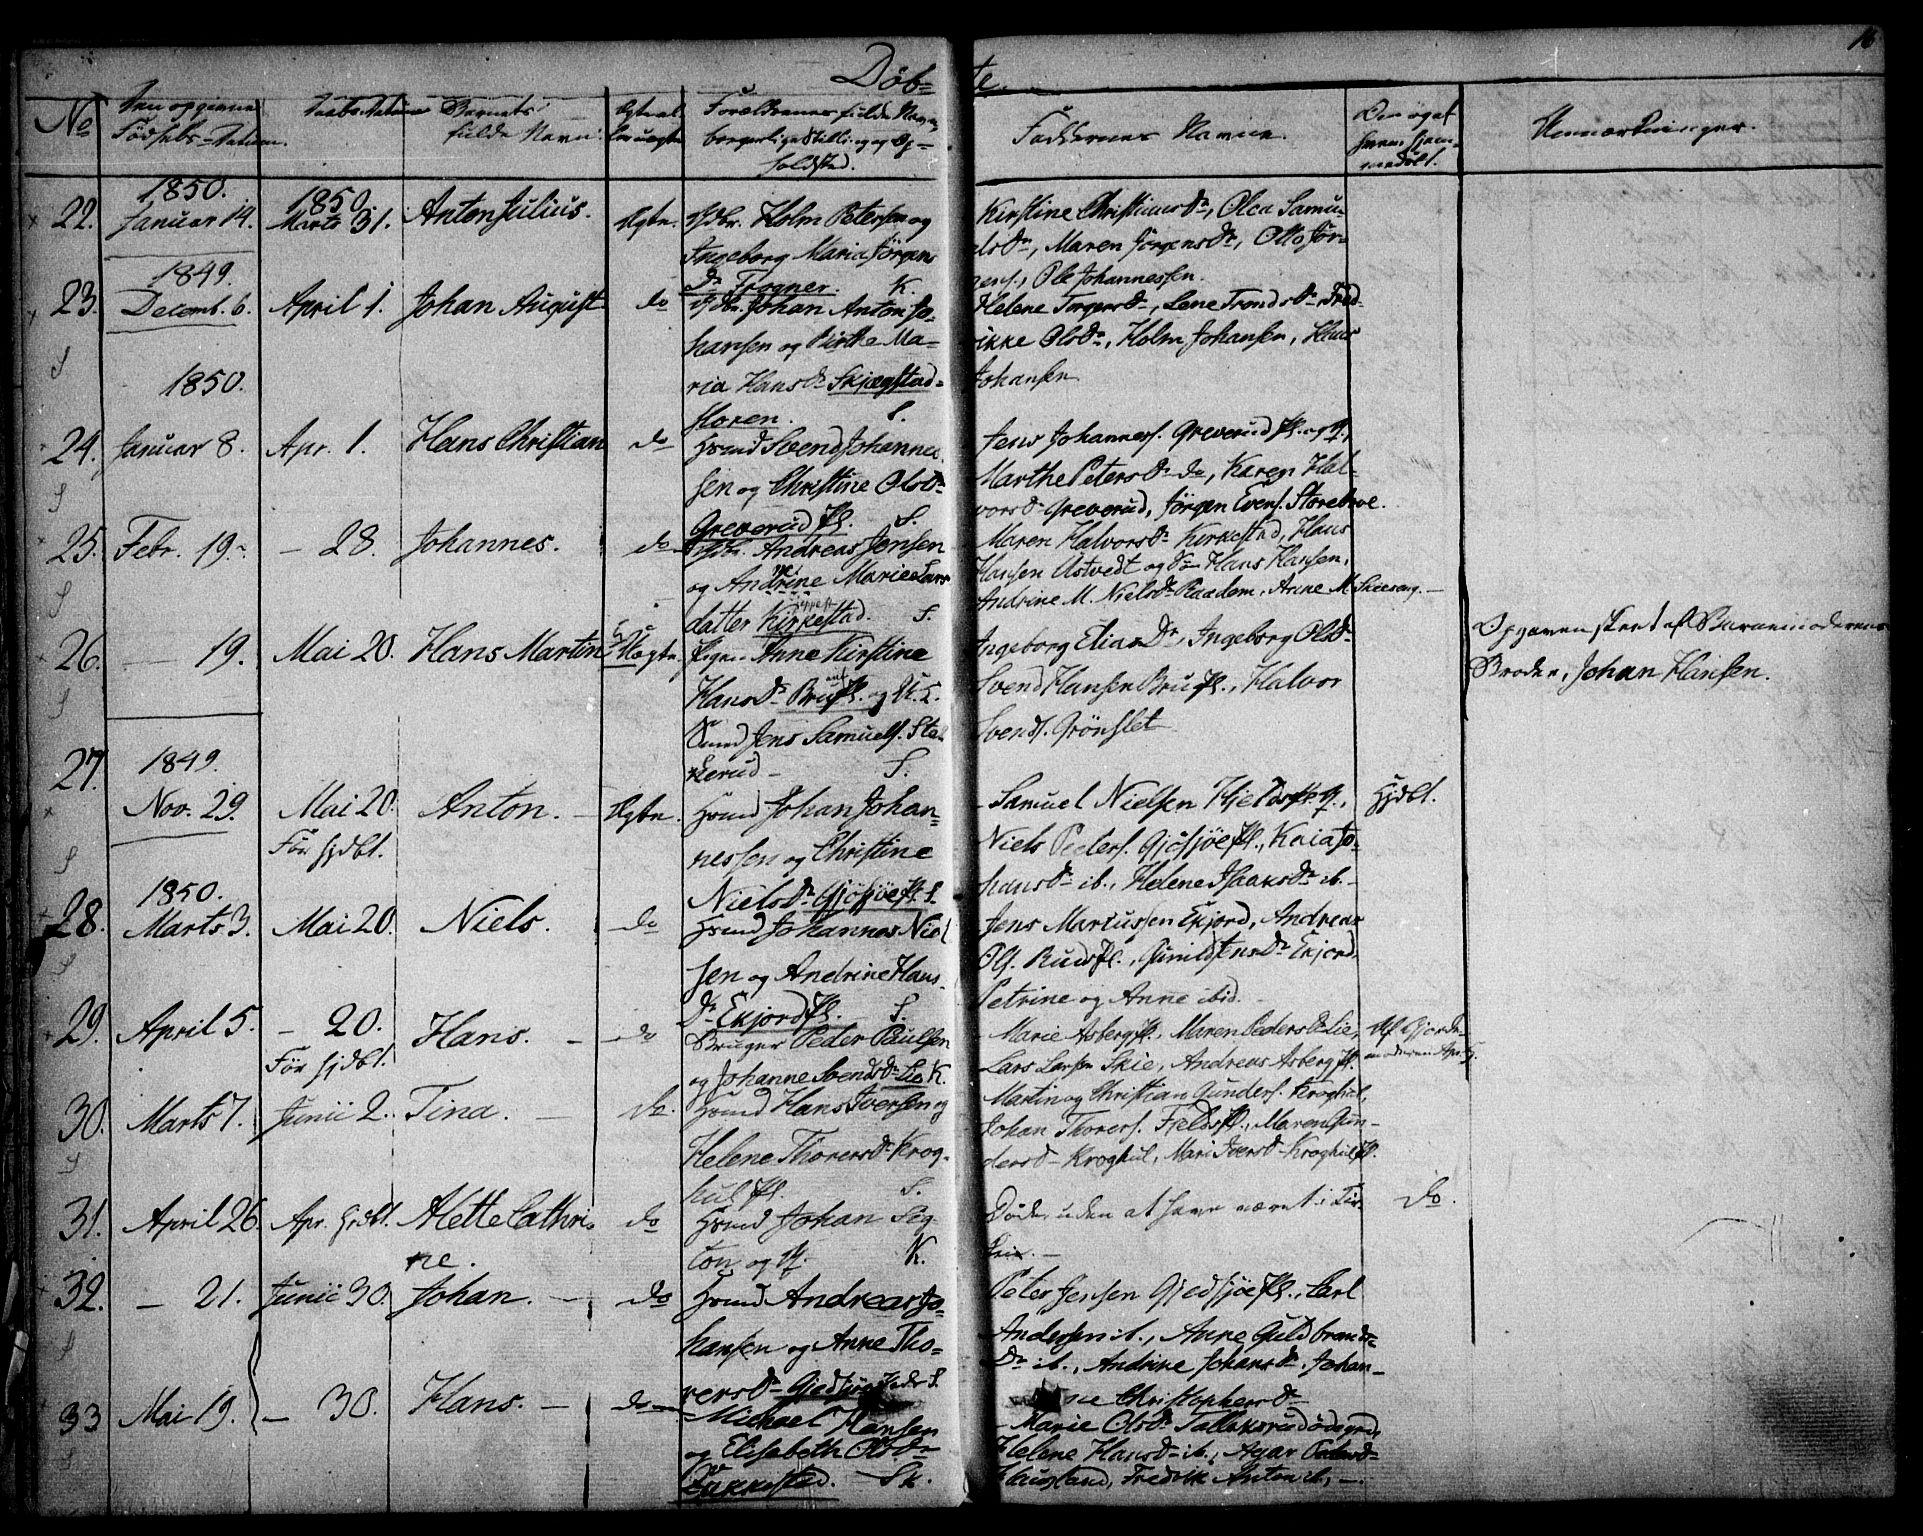 SAO, Kråkstad prestekontor Kirkebøker, F/Fa/L0006: Ministerialbok nr. I 6, 1848-1857, s. 16